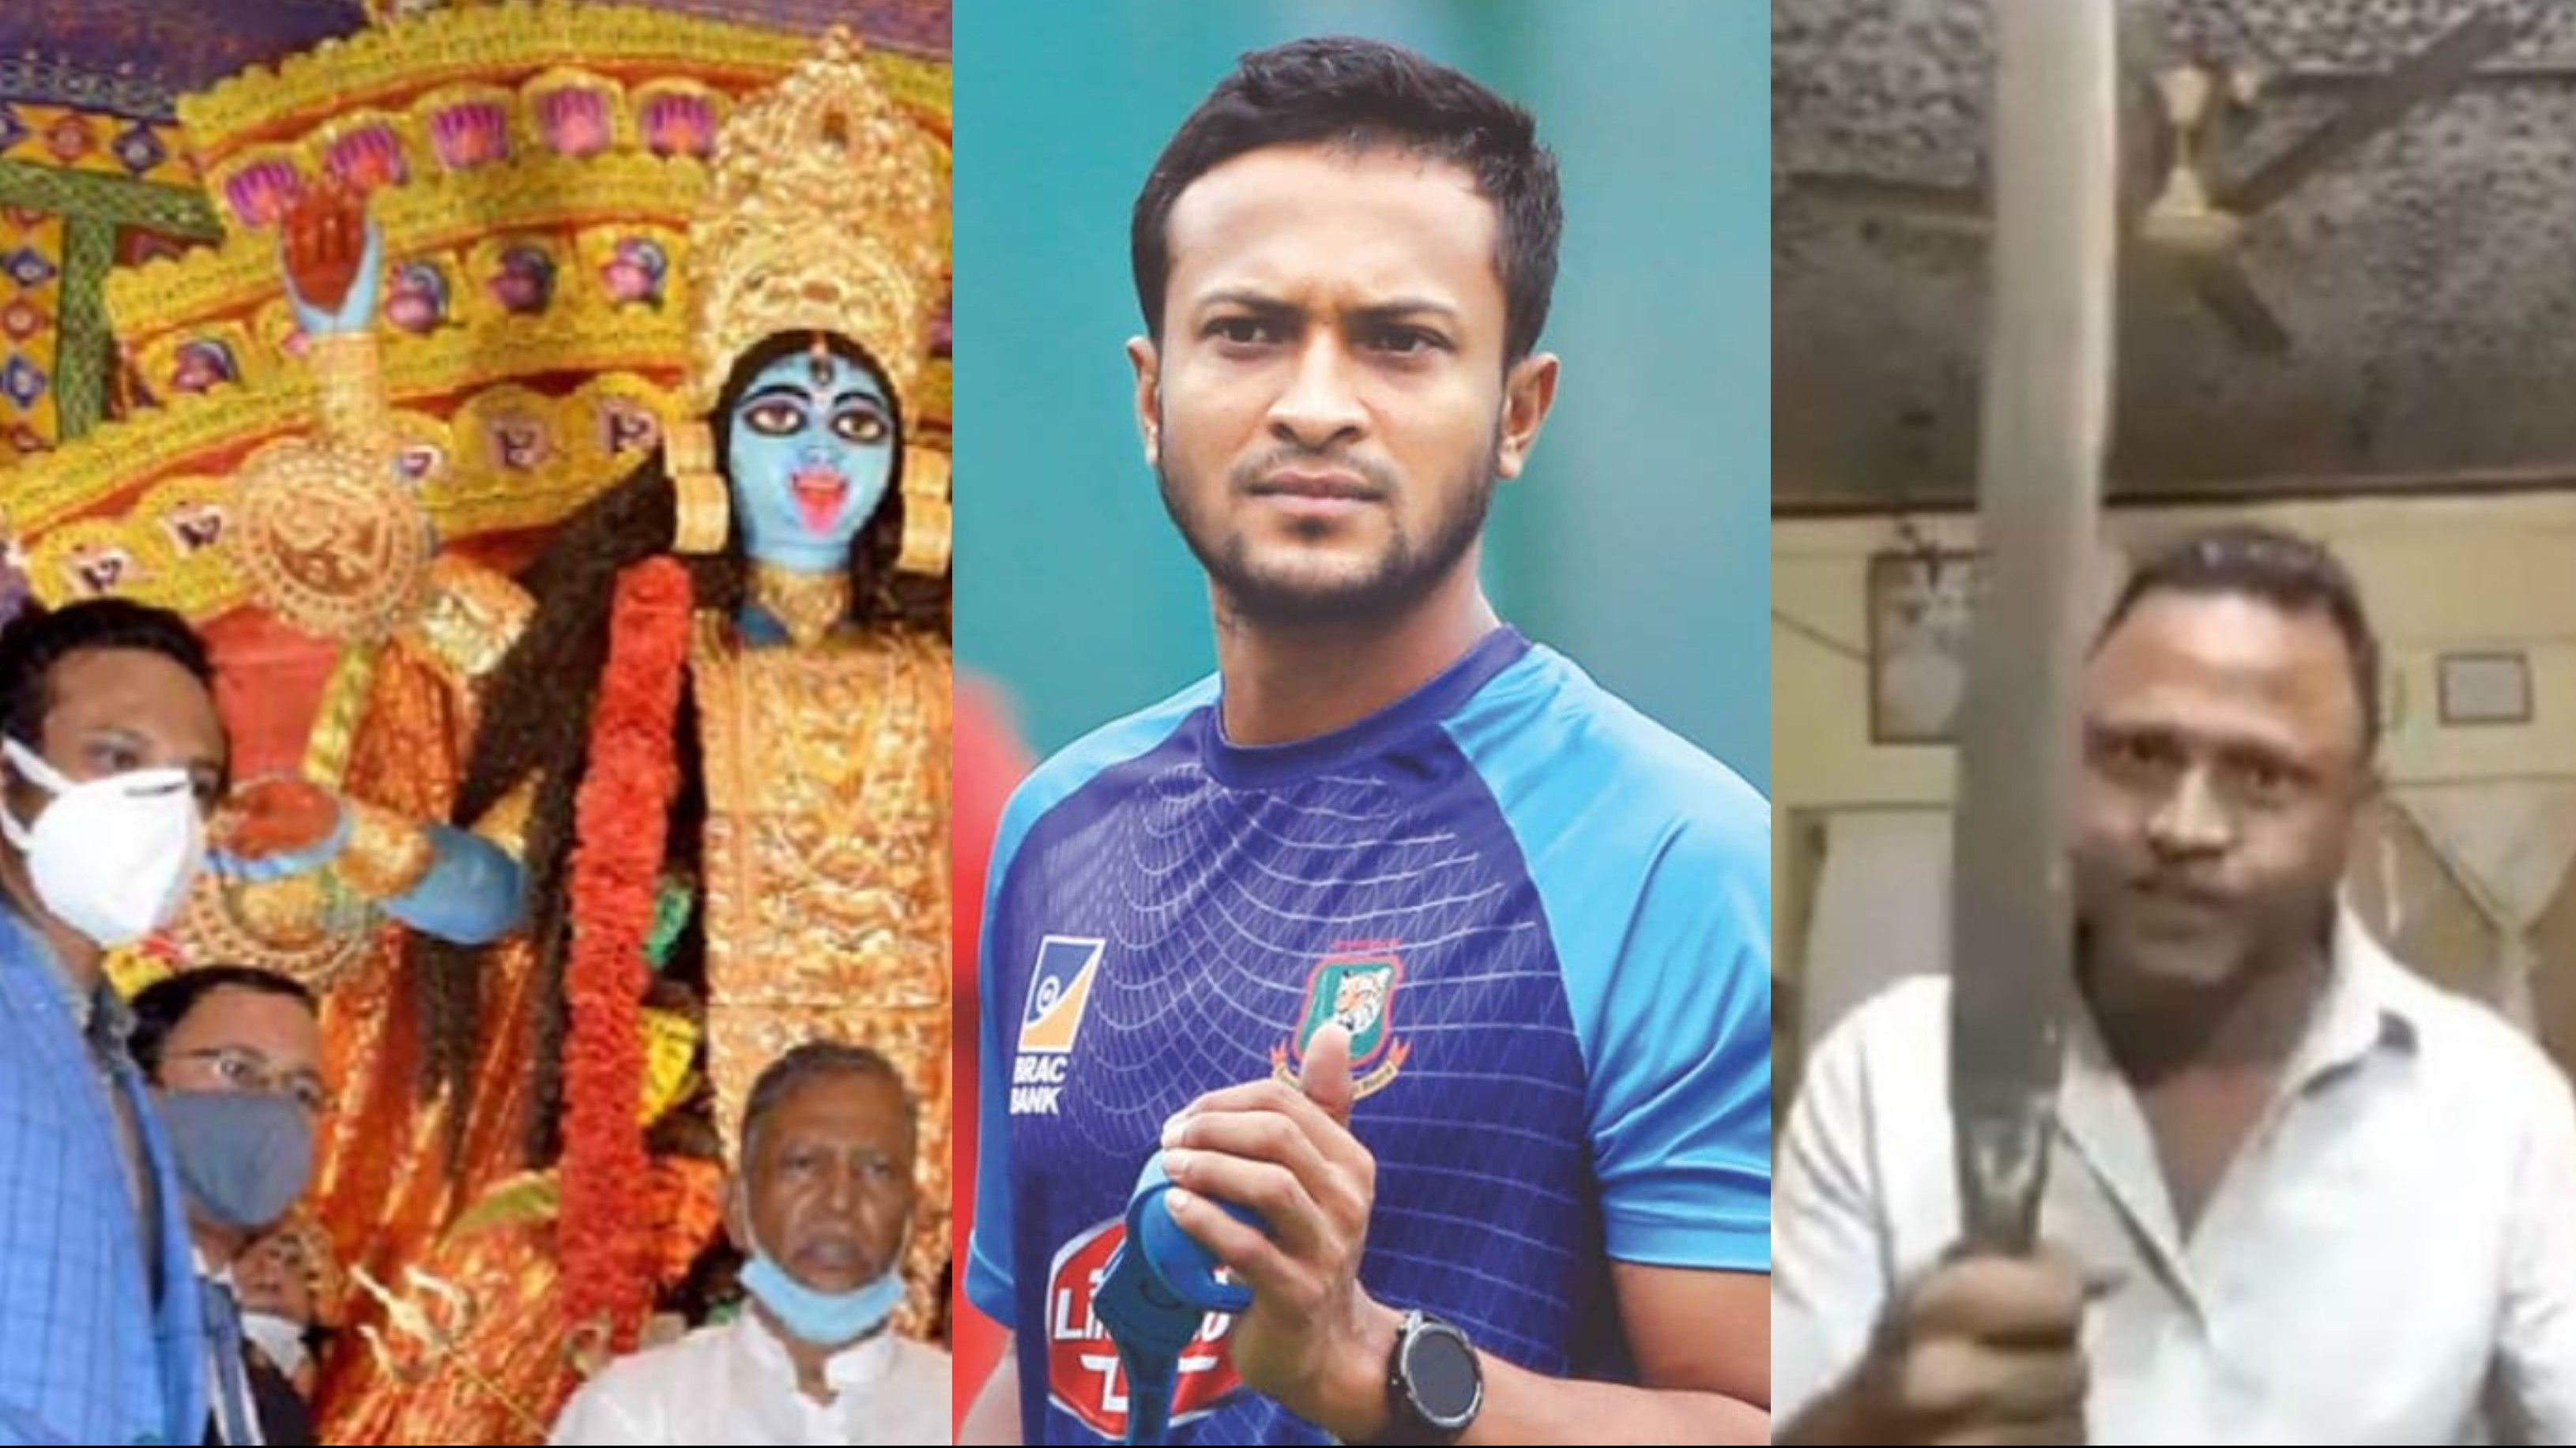 Bangladeshi man giving Shakib Al Hasan death threats for attending Kali puja arrested